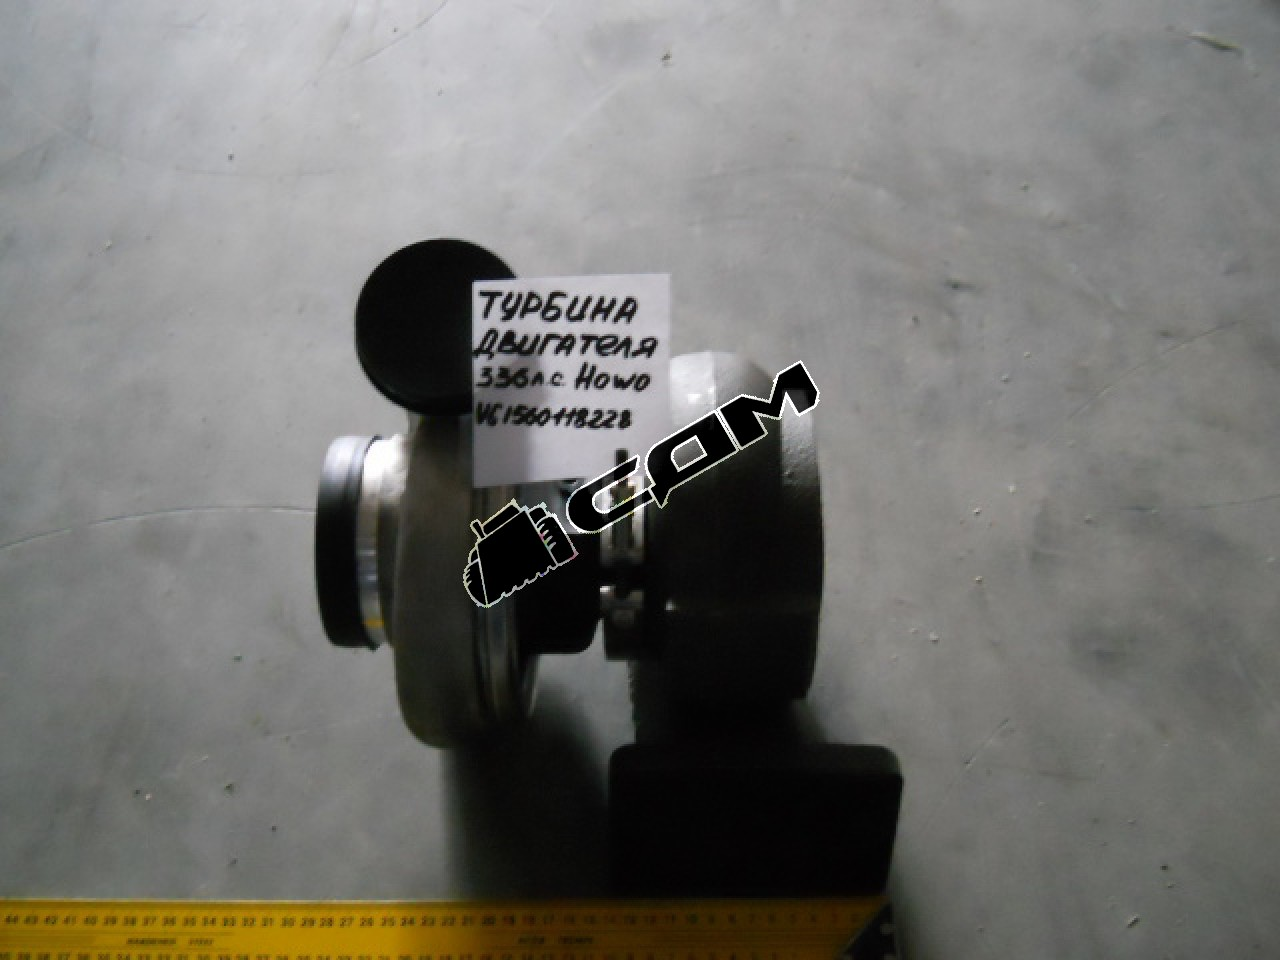 Турбина двигателя 336л.с. HOWO  VG1560118228